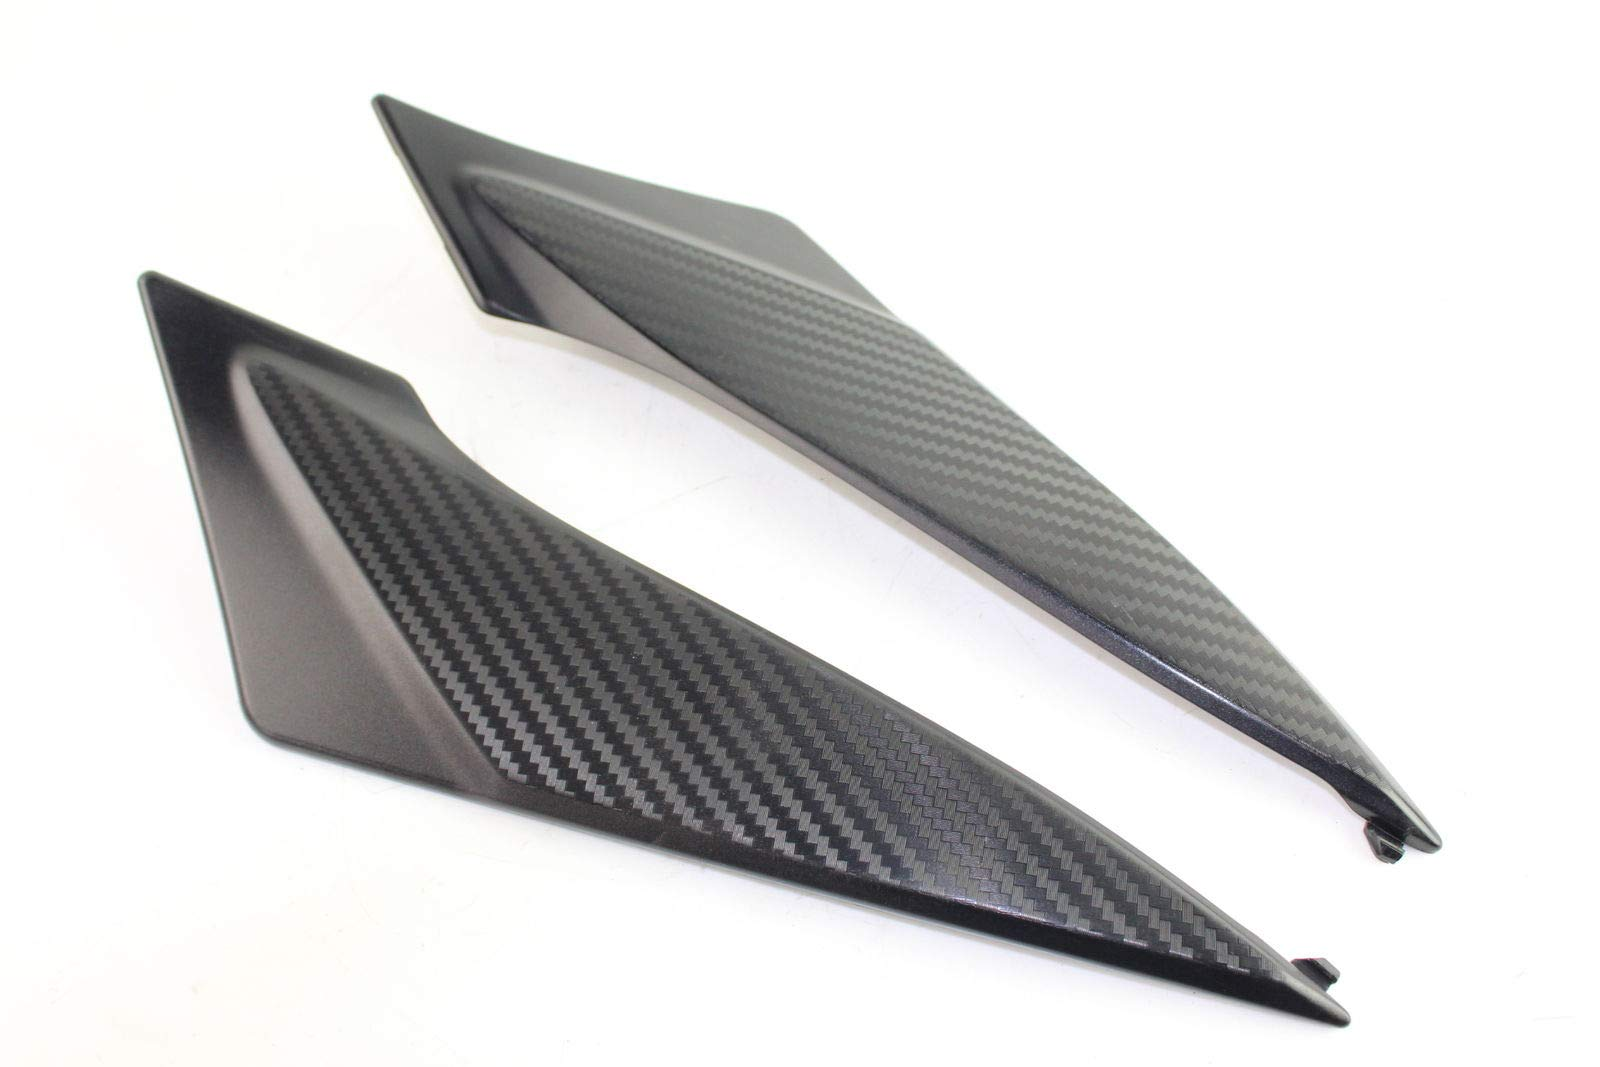 For 2011-2015 Suzuki GSXR600 GSXR750 GSXR 600 750 K11 Gas Tank Side Faring Panels Cover Black Left & Right Fairing Parts